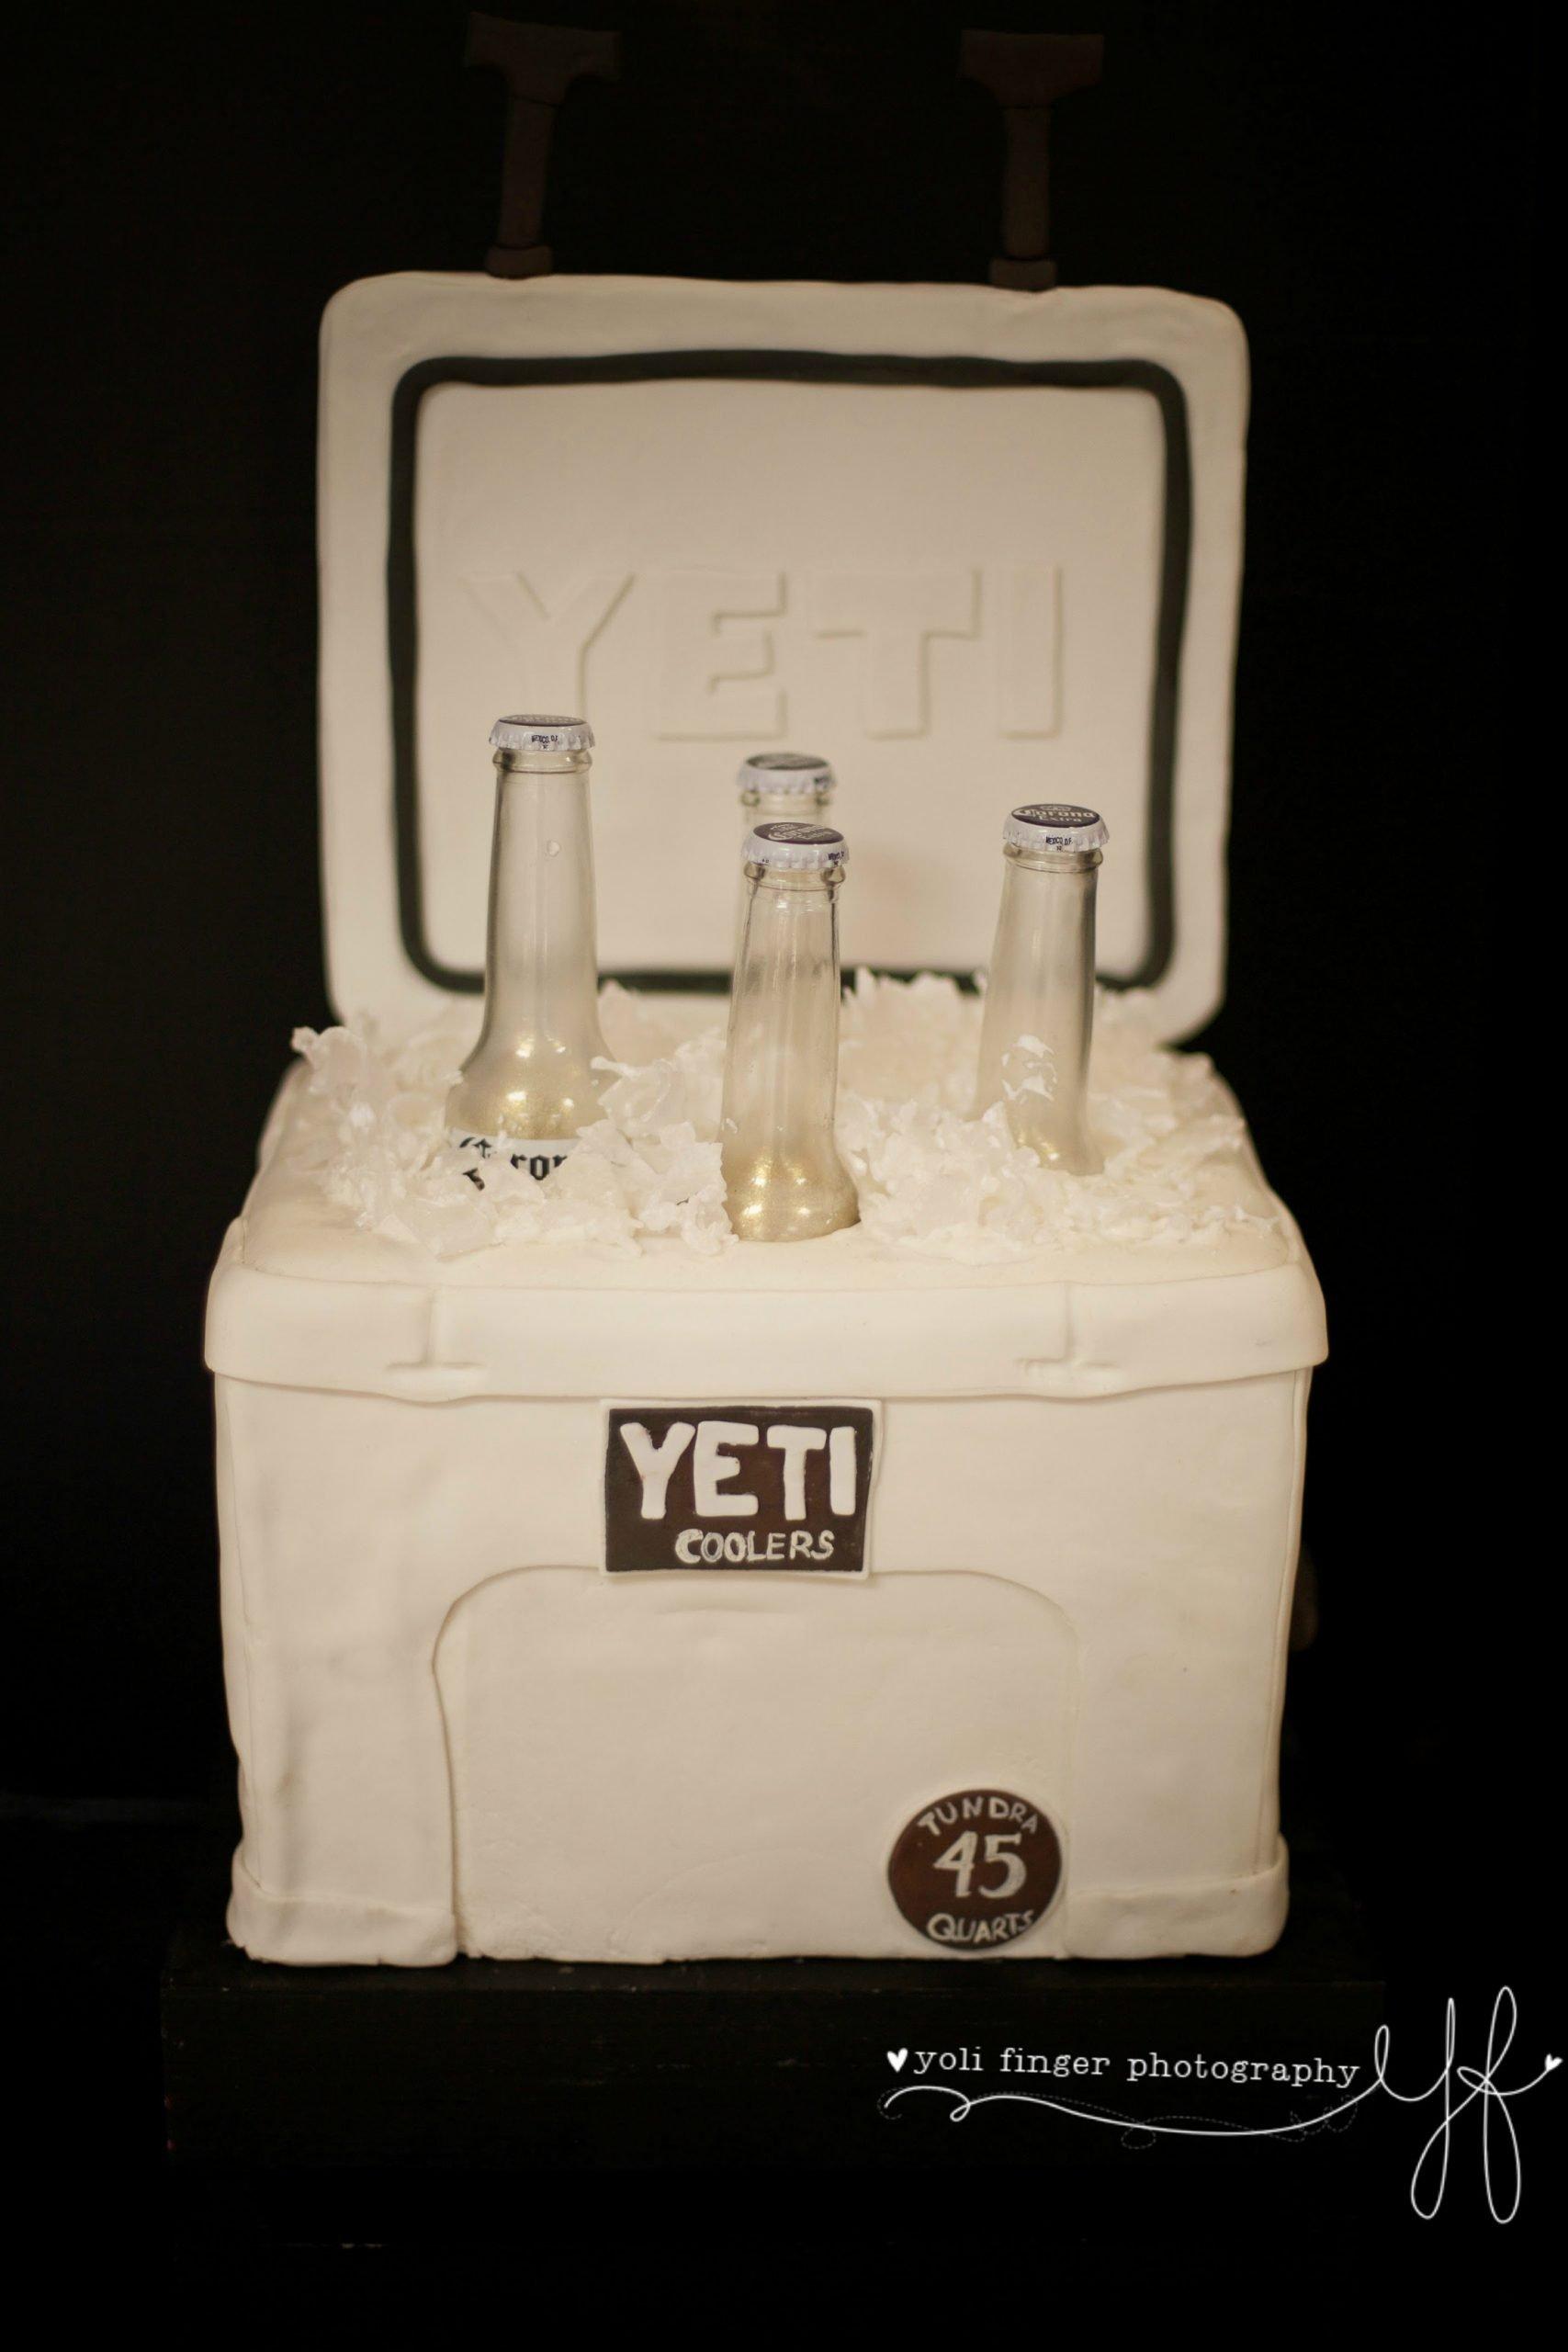 The Cake Shop Yeti Cooler